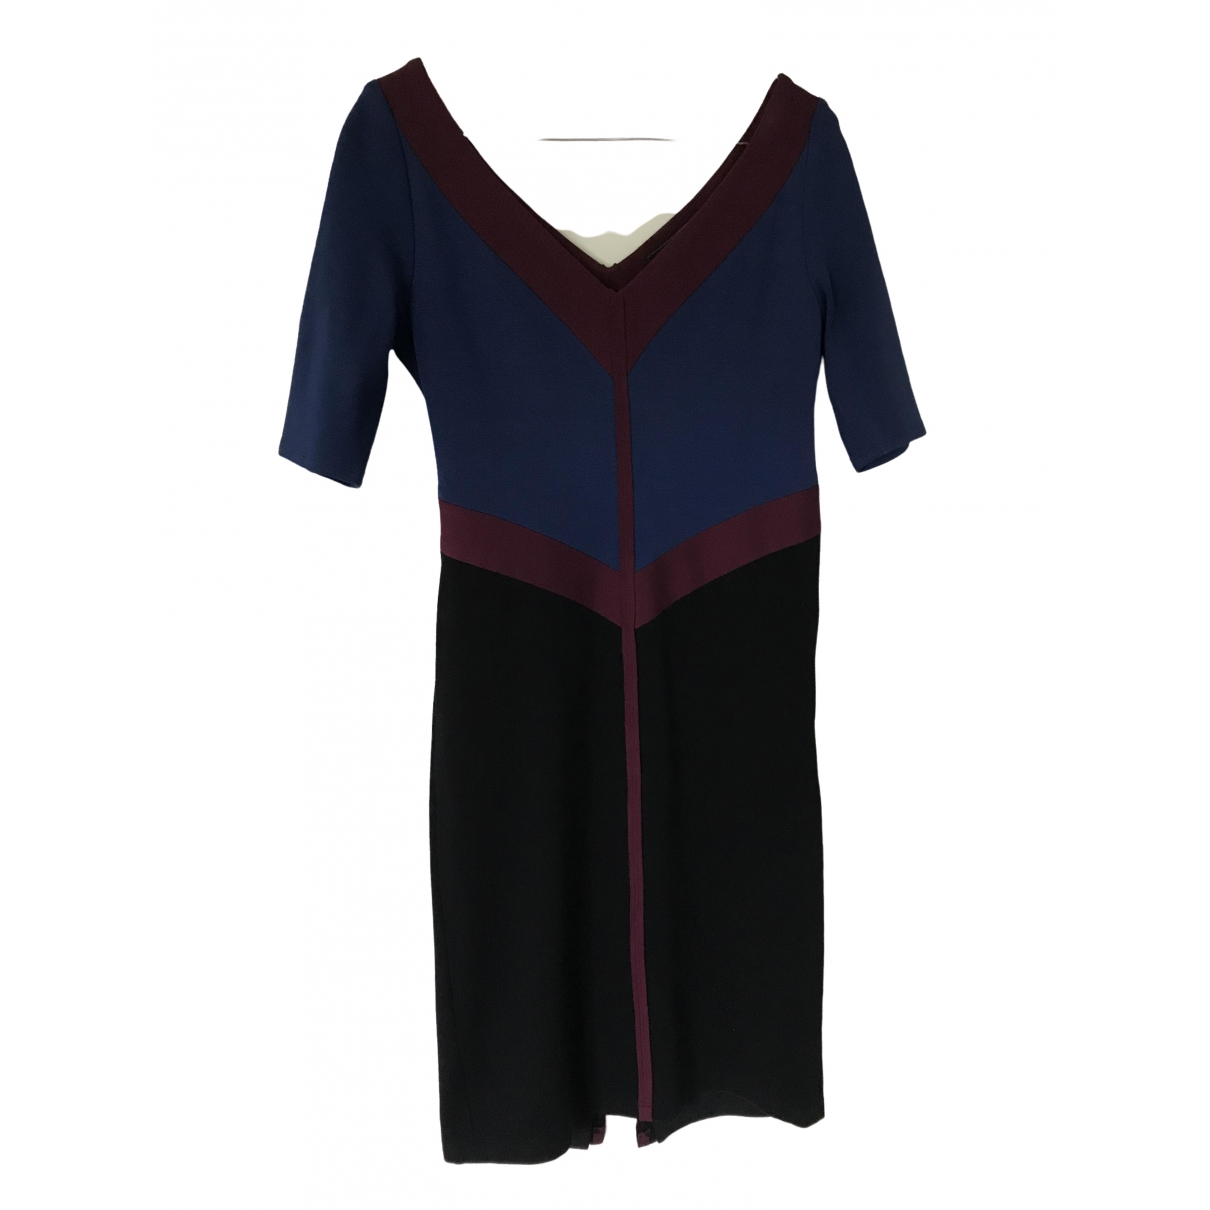 Bcbg Max Azria \N Blue dress for Women 34 FR